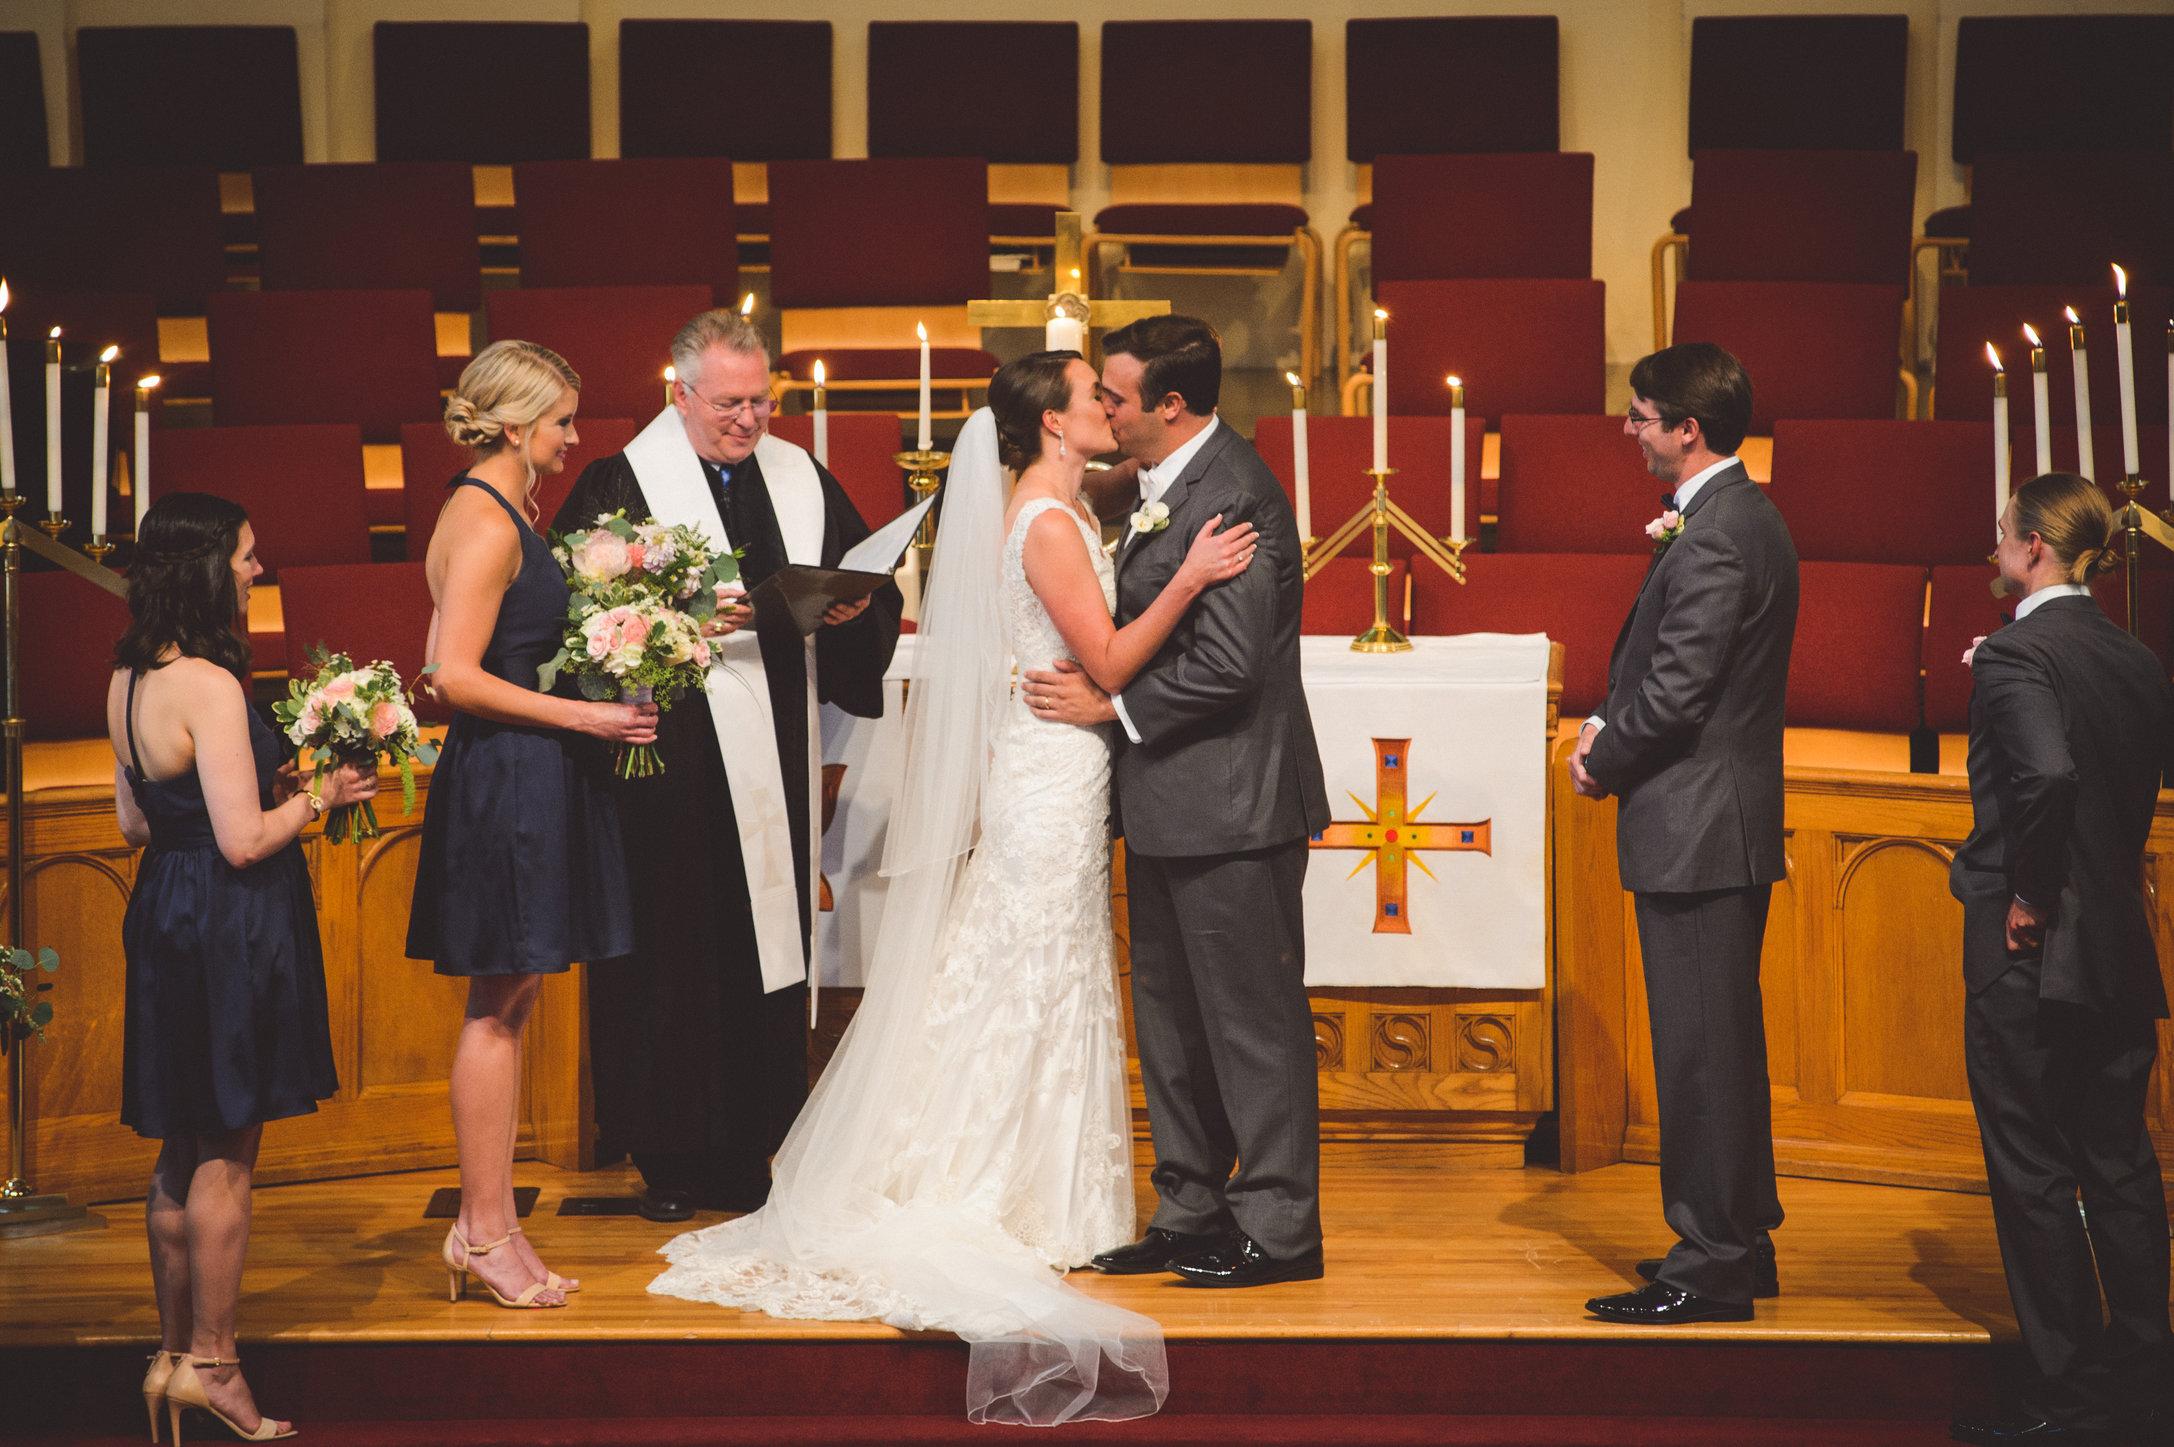 SandC-wedding-224.jpg